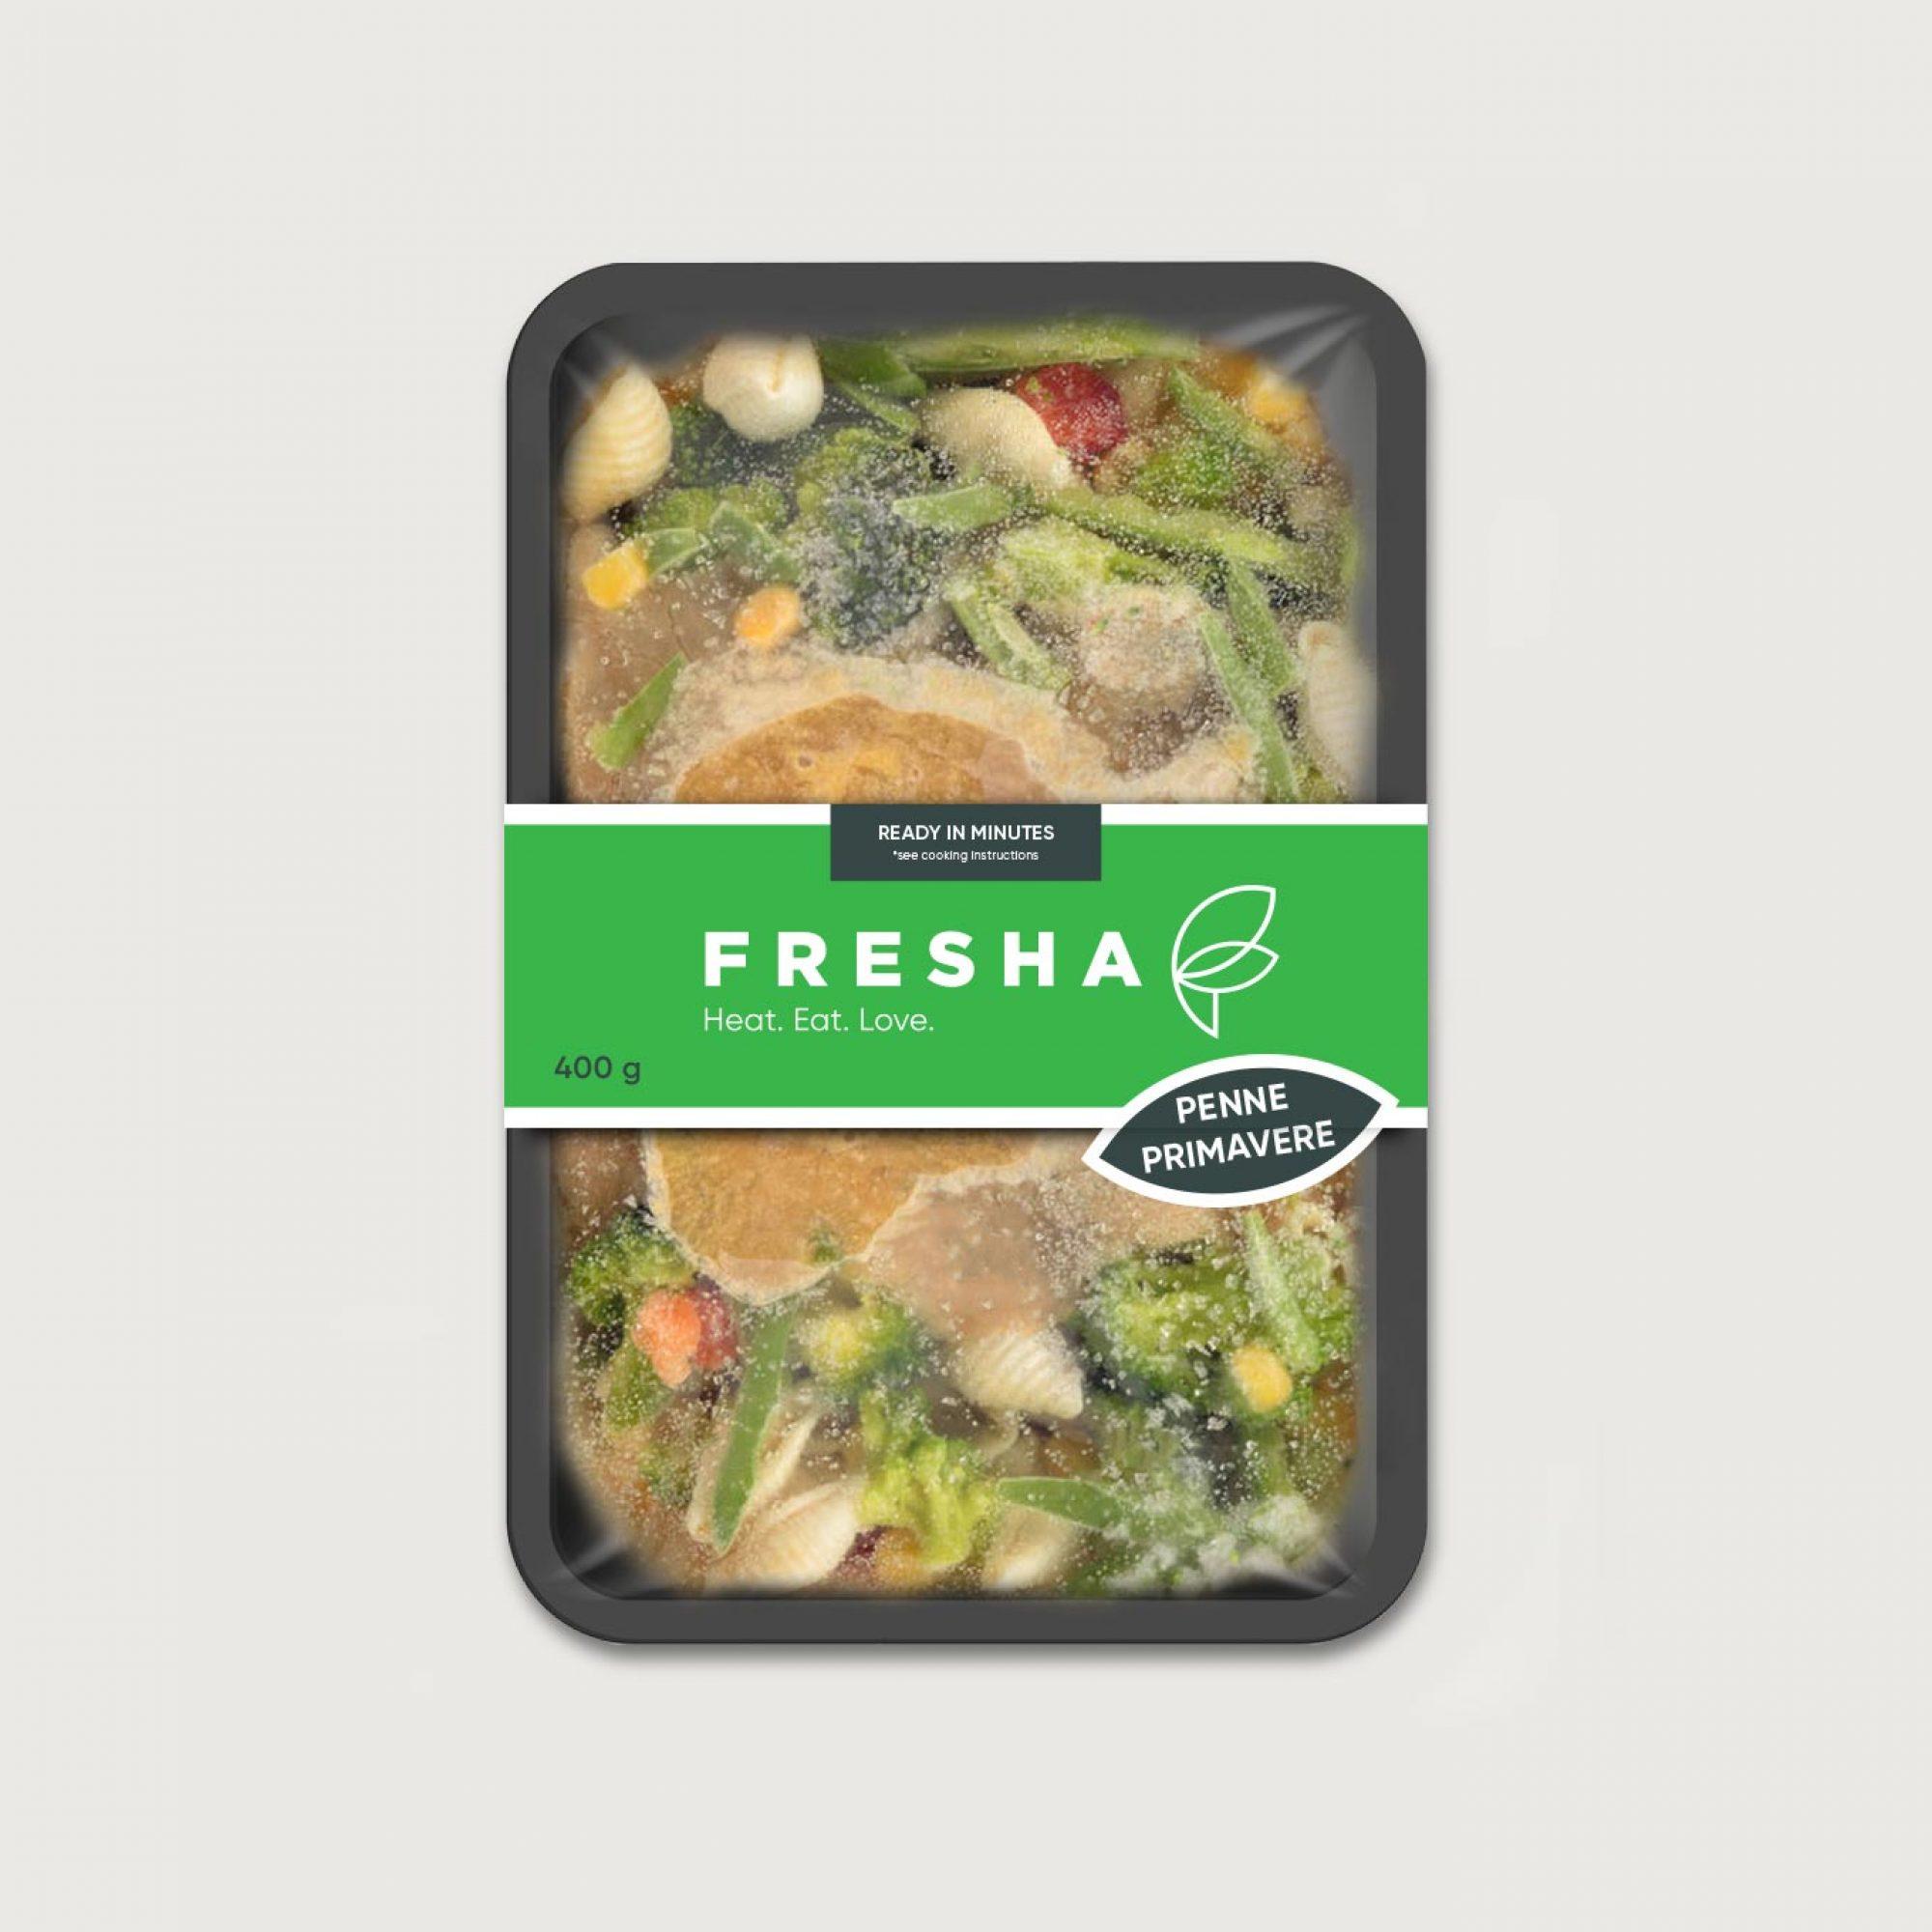 Fresha-Sleeve-Packaging_2